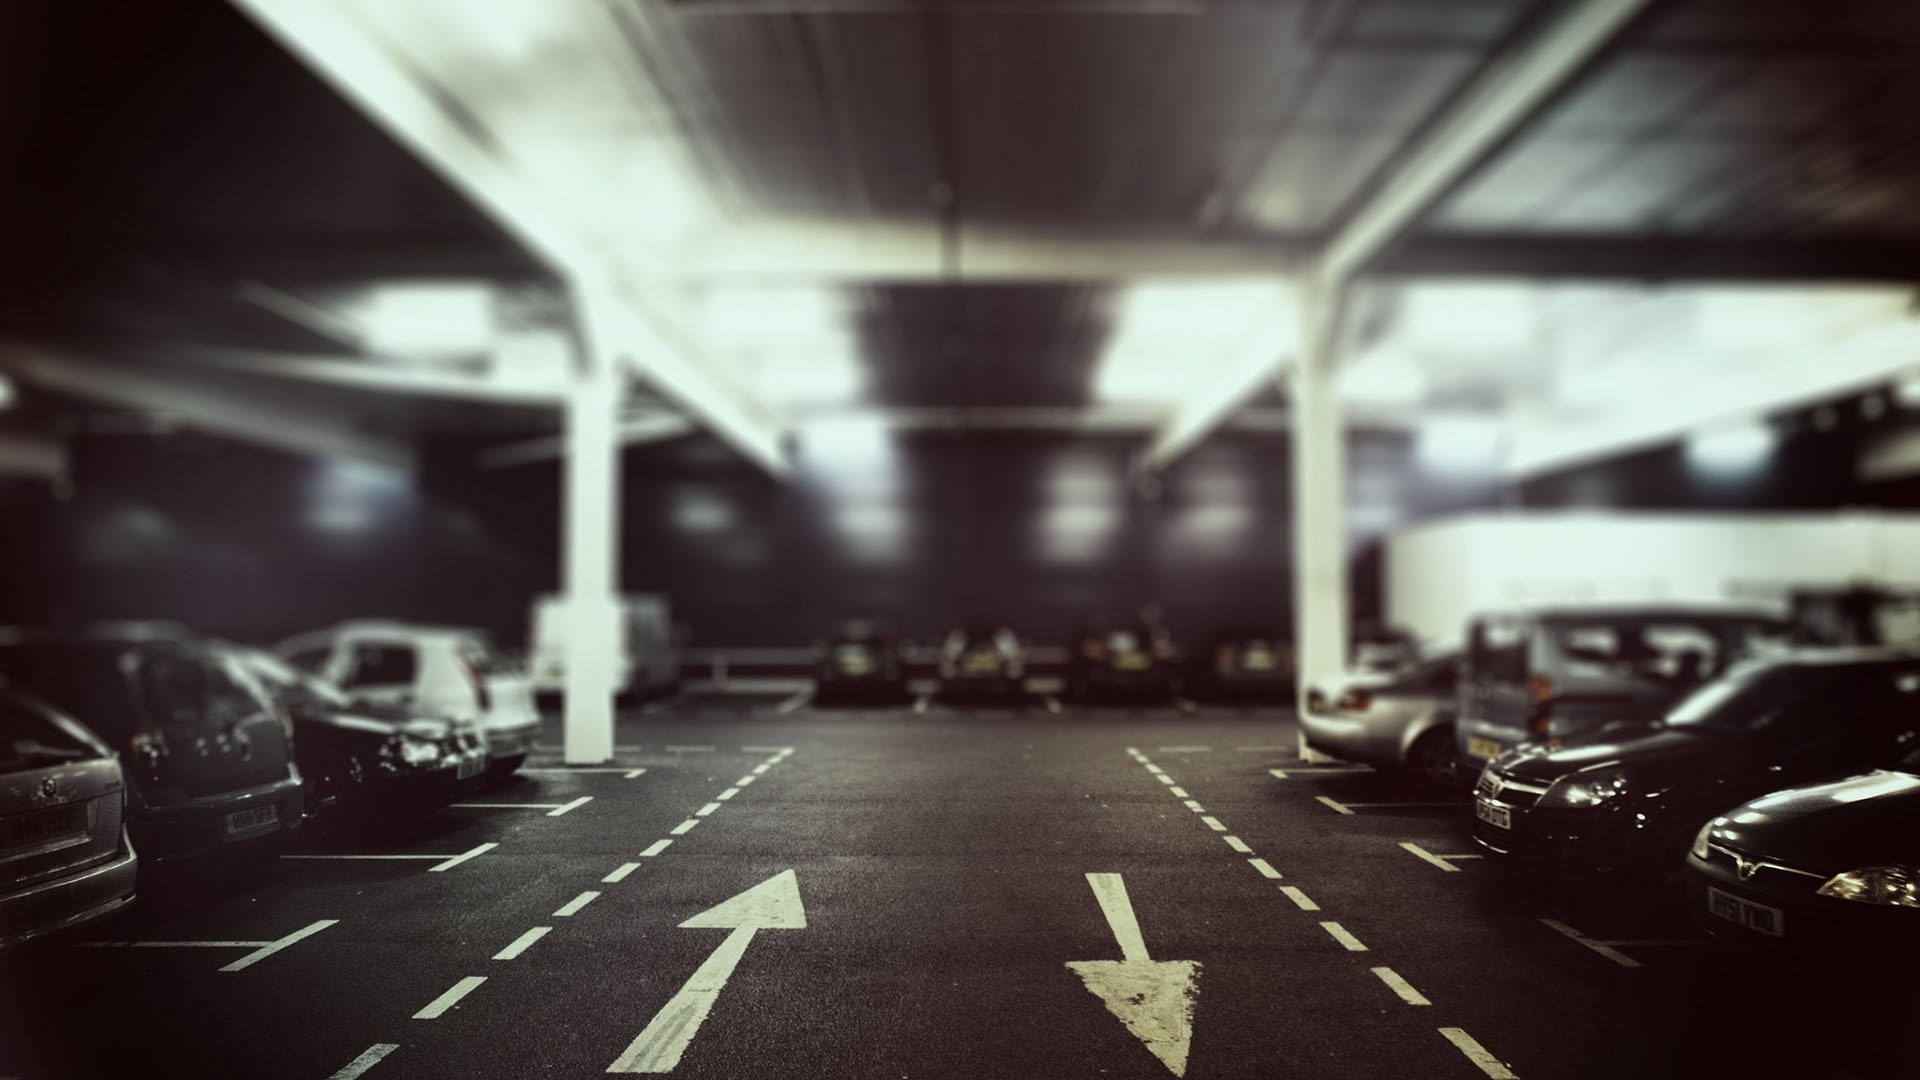 Location parking: ni vu ni connu